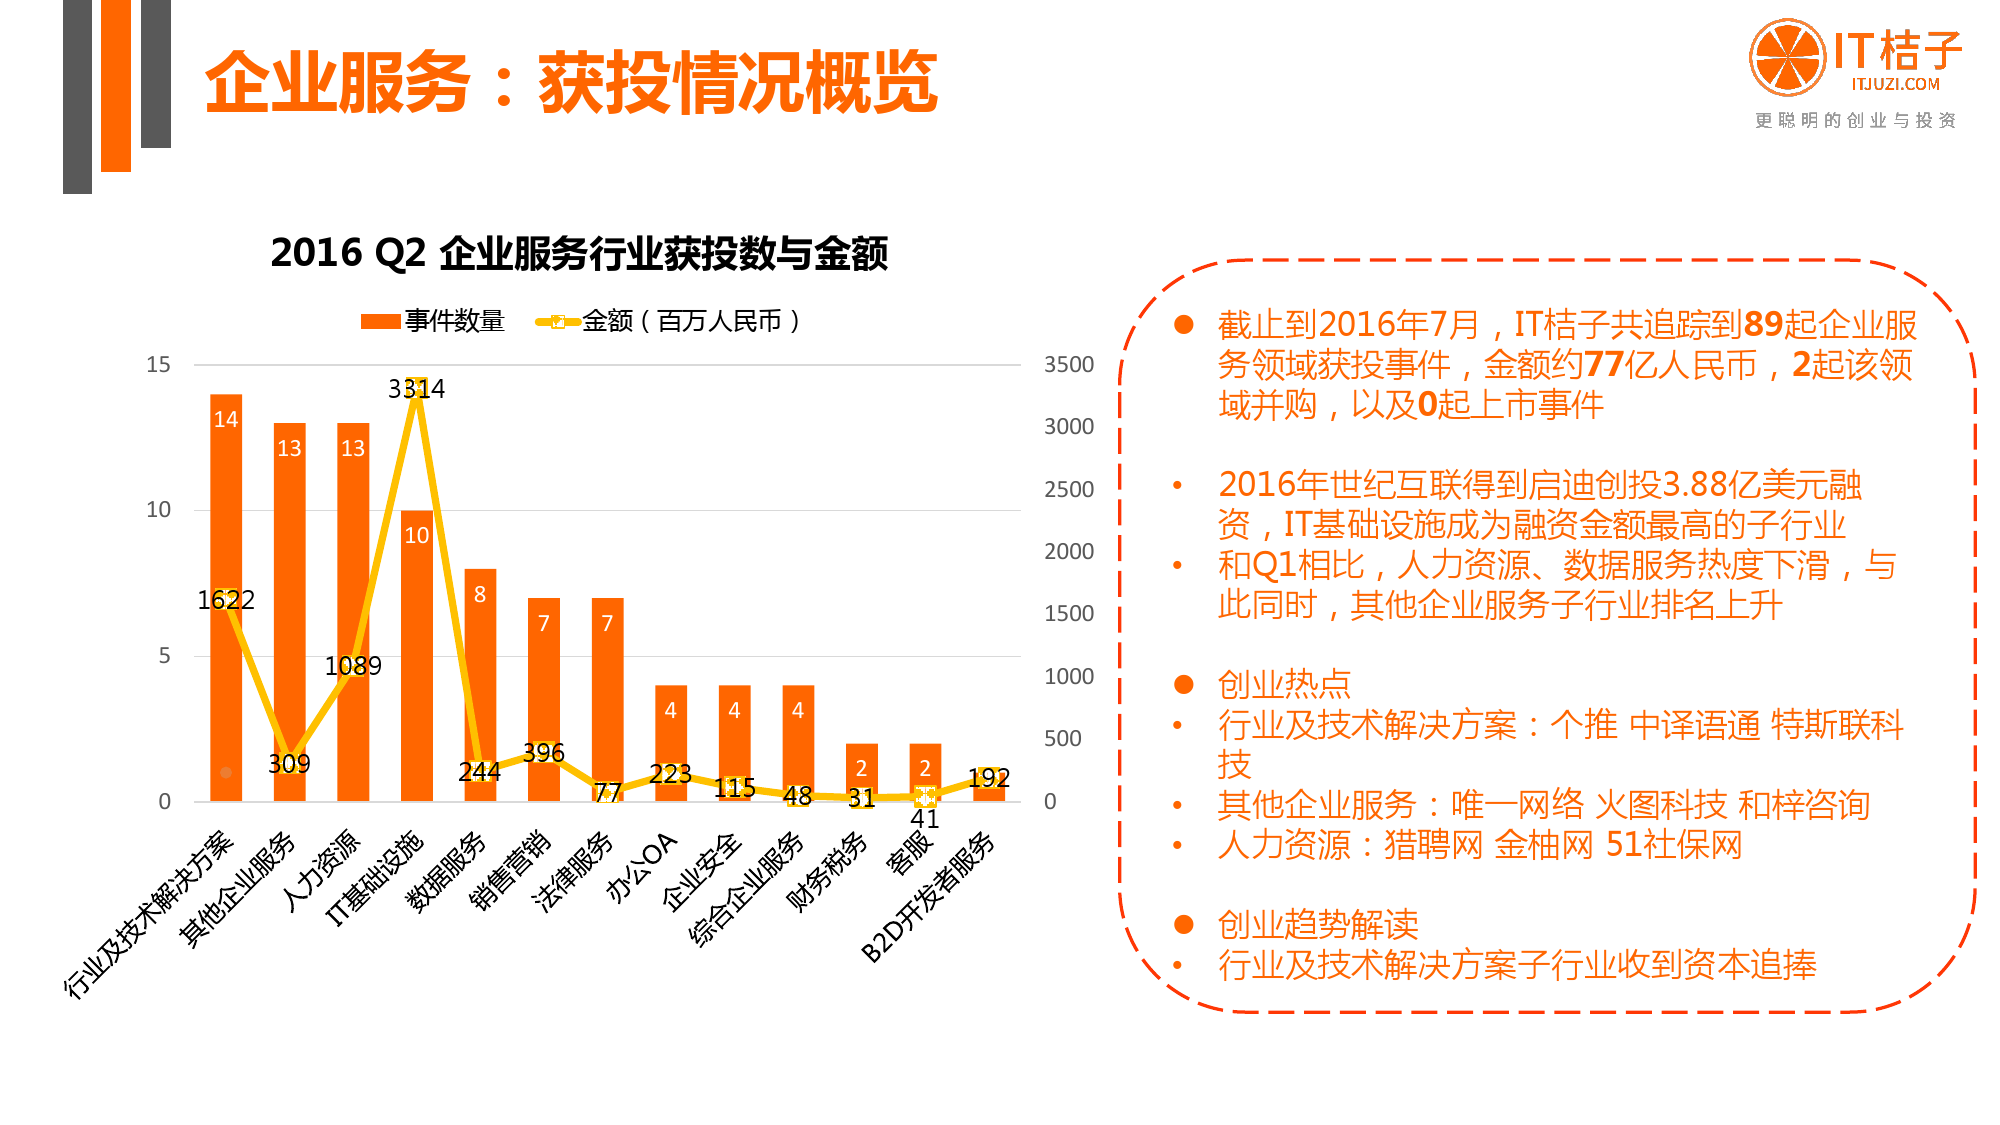 【IT桔子】2016年Q2中国互联网创业投资分析报告_000033